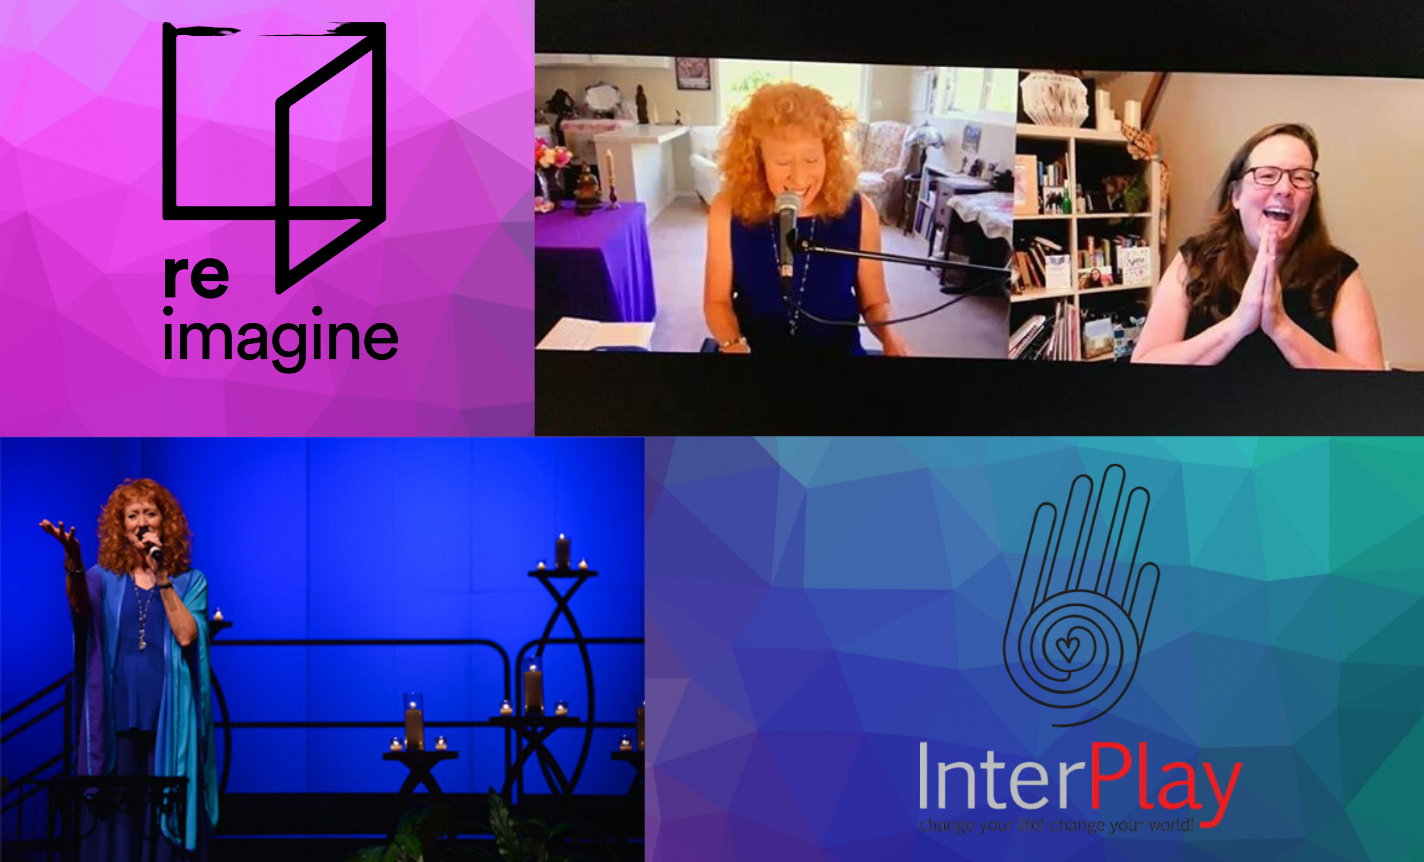 Radical Self-Care with InterPlay & Karen Drucker